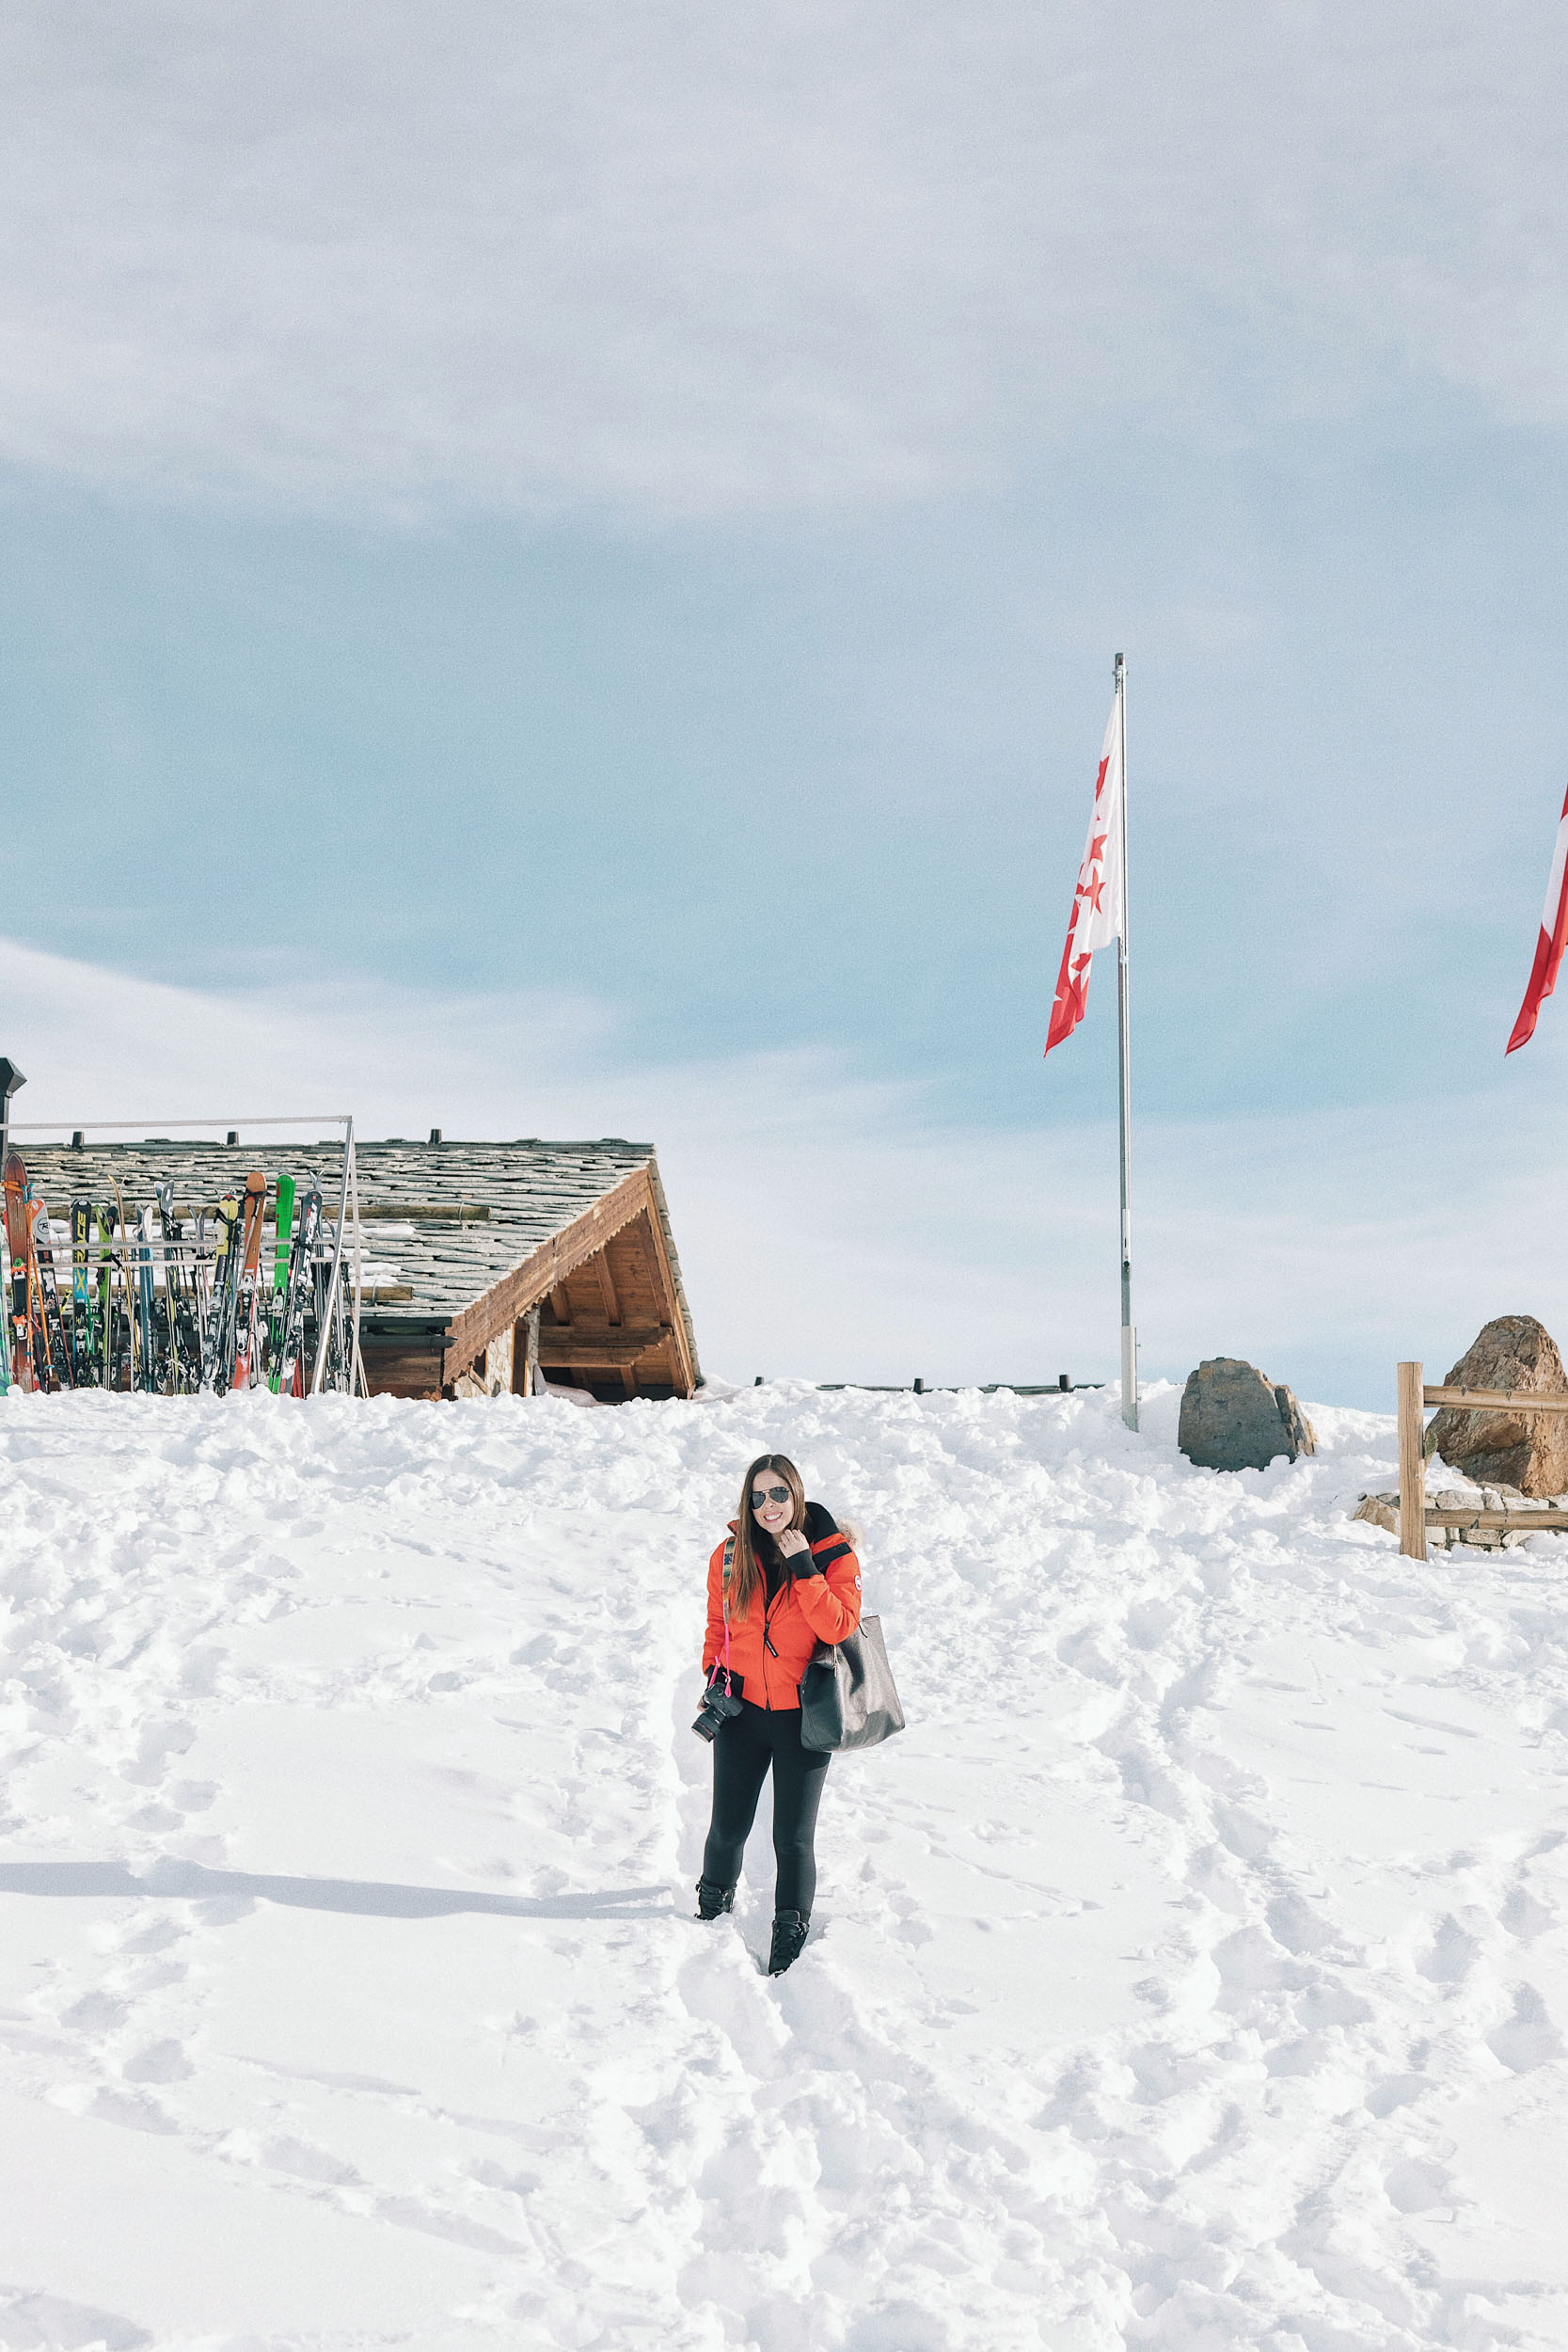 A beautiful and sunny winter day in Zermatt, Switzerland